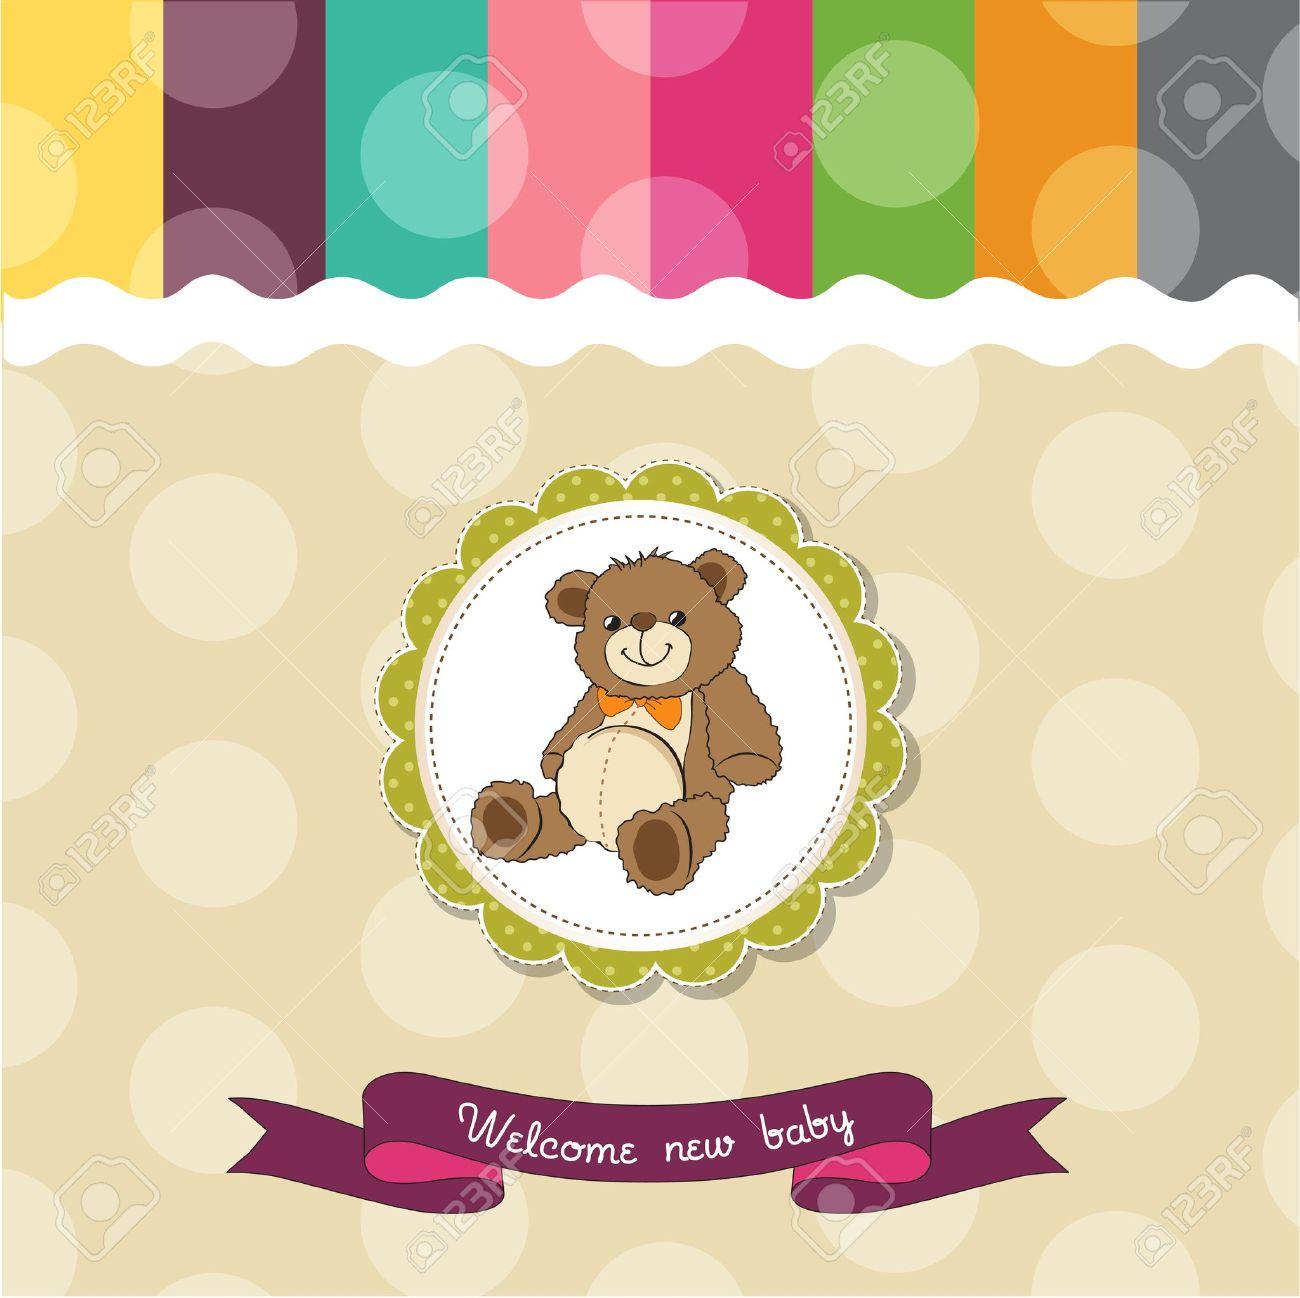 baby shower card with cute teddy bear toy Stock Vector - 14662005